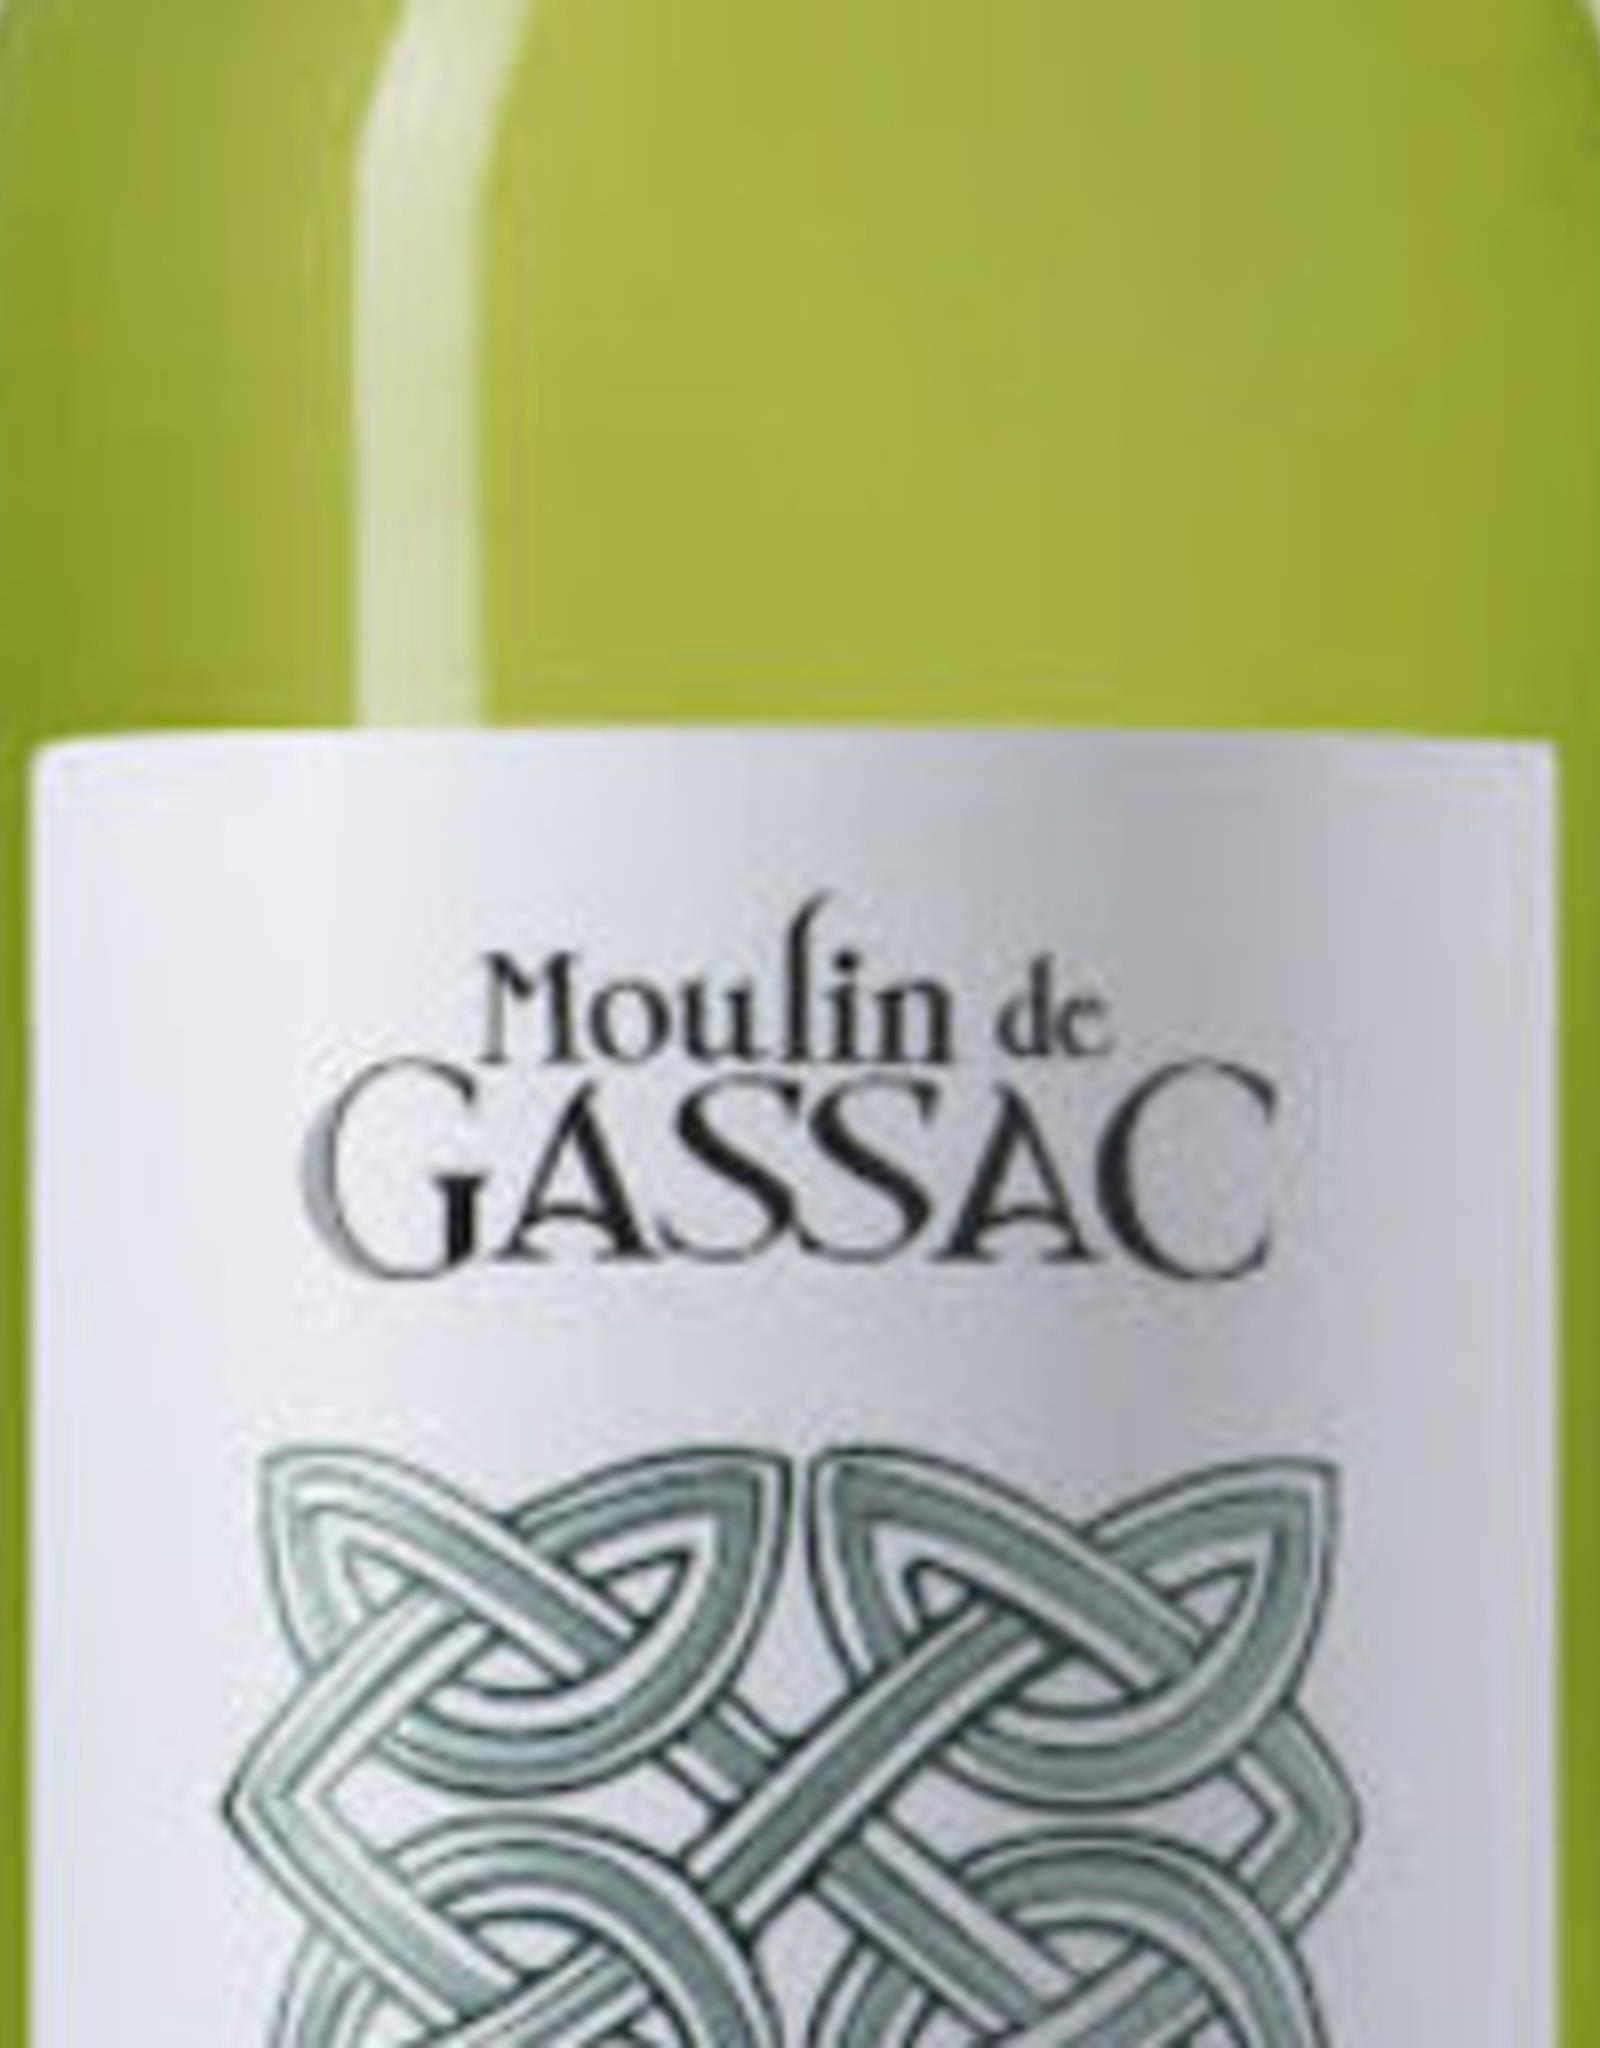 White Blend, Guilhem, Moulin de Gassac 2020